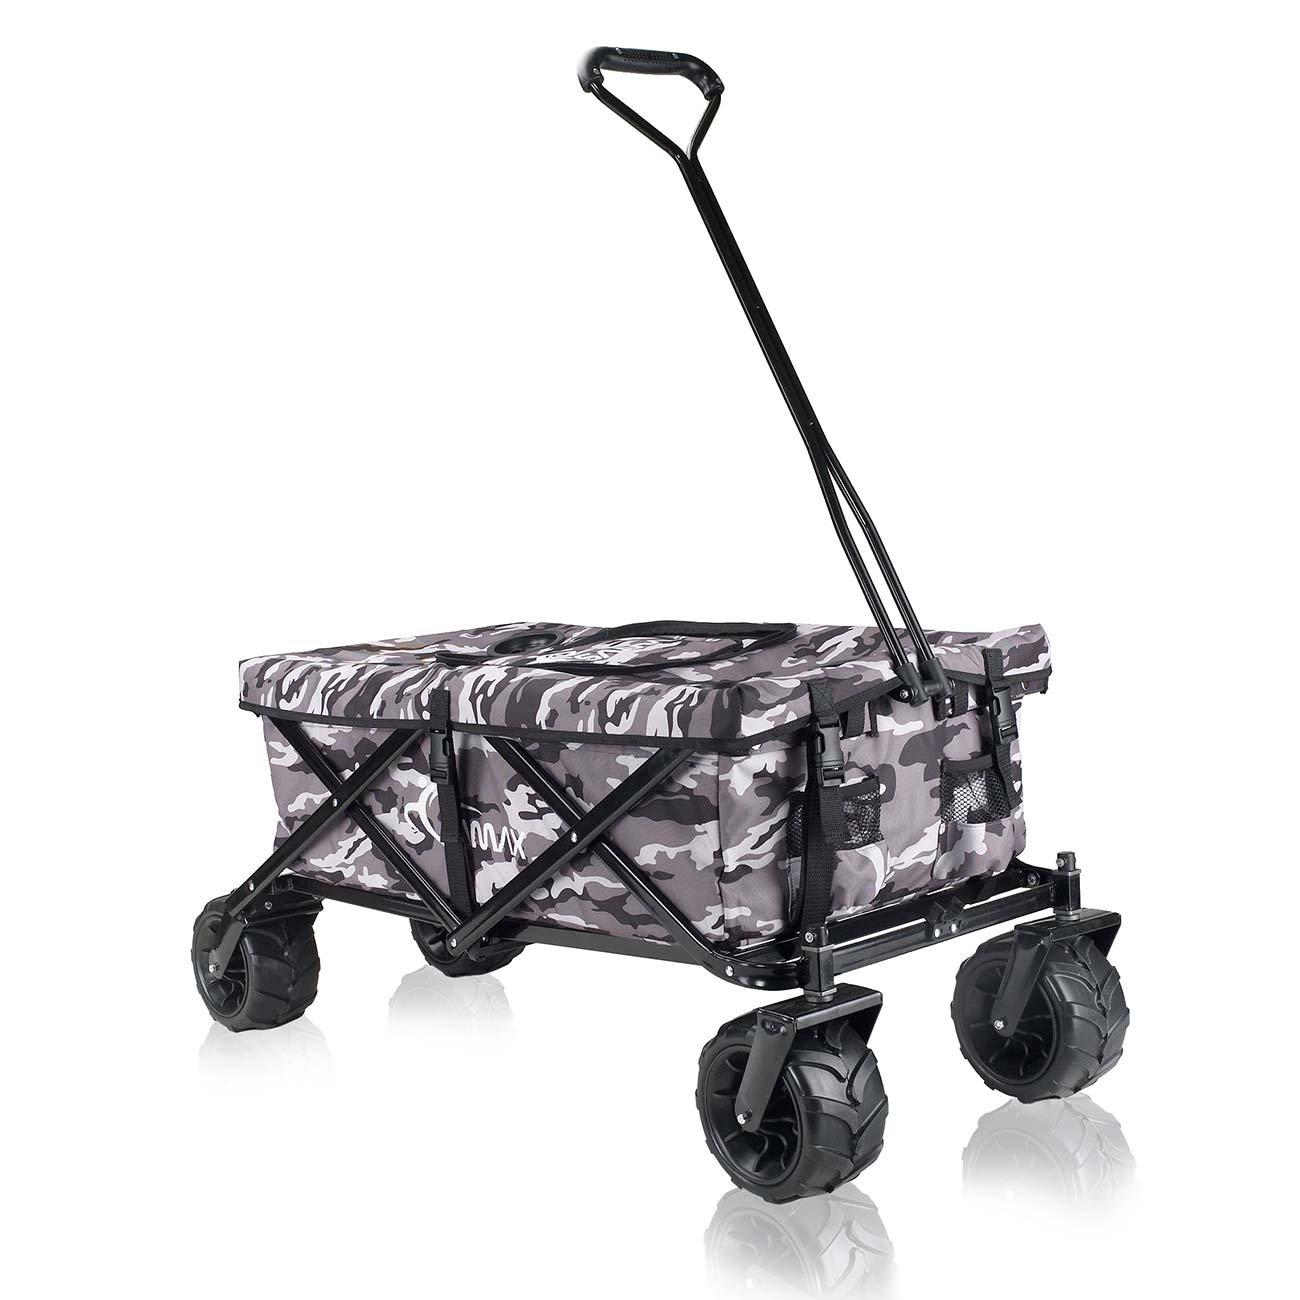 SAMAX Hand Cart Wagon Trolley Garten Cool Bag Coaster Wagen Foldable Camouflage